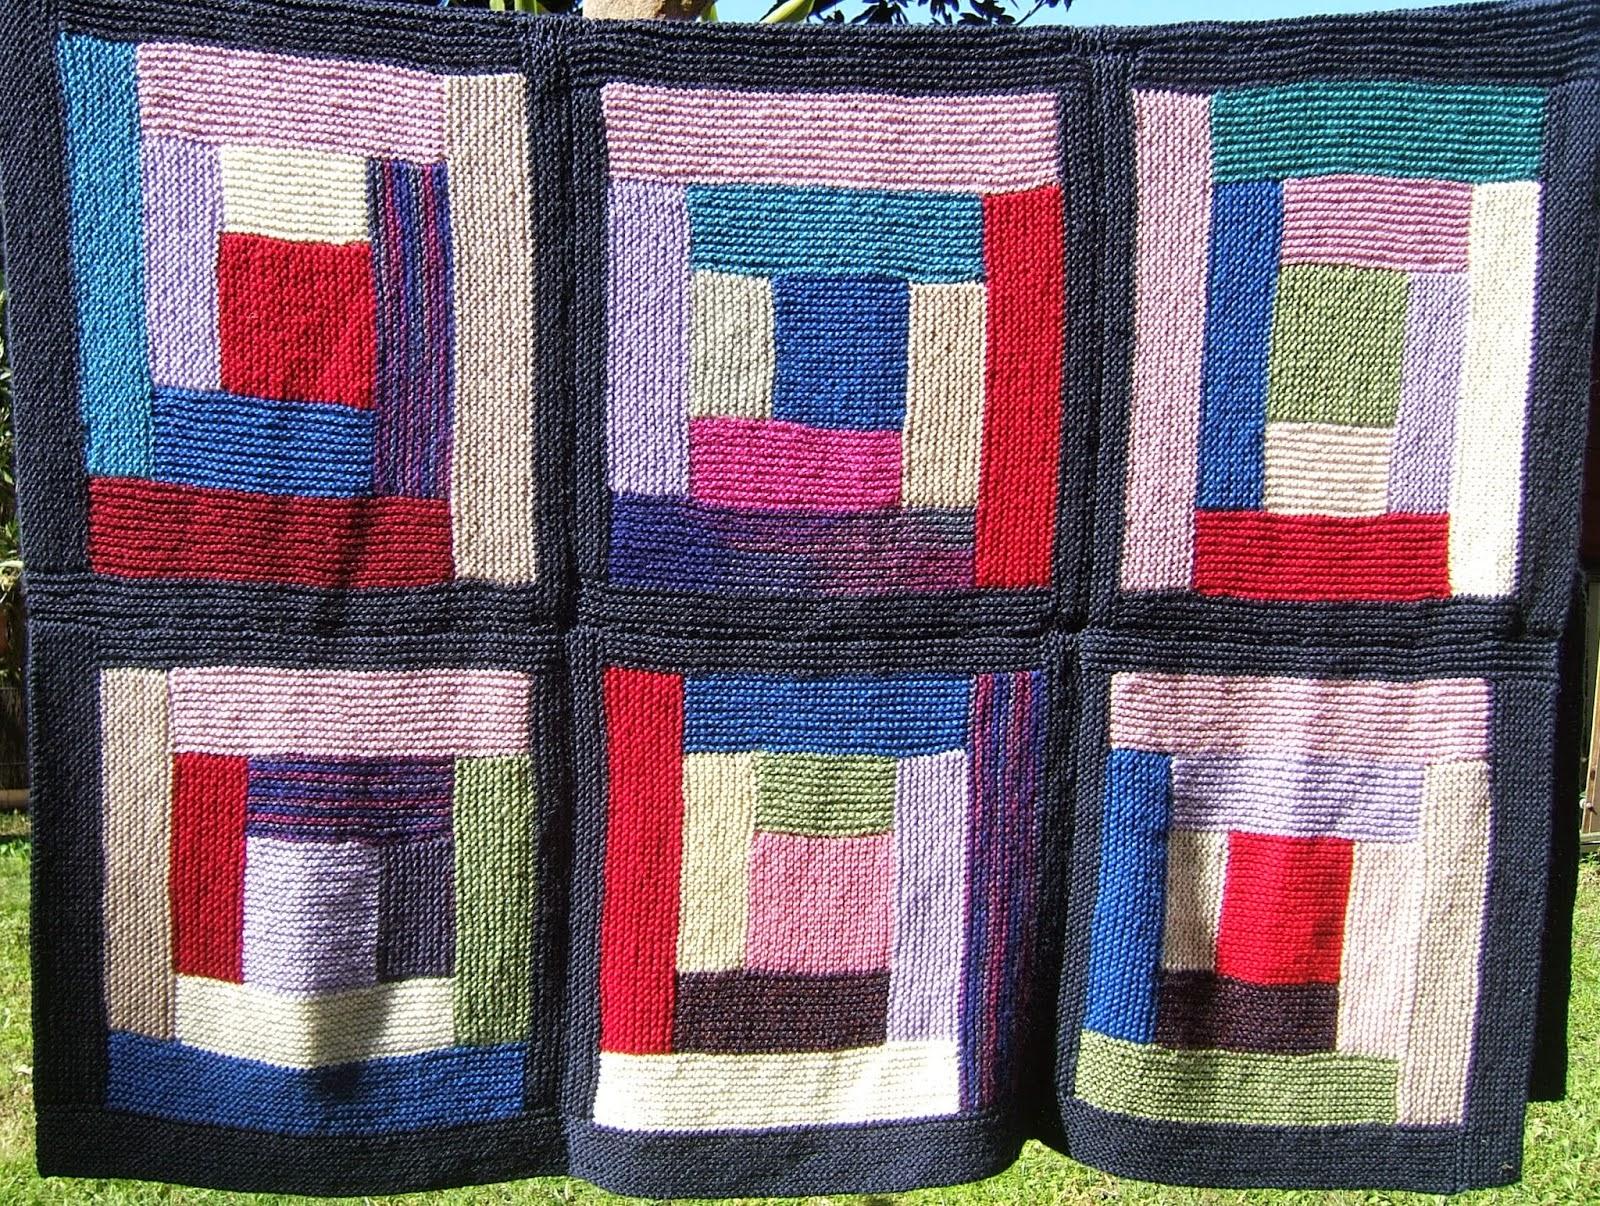 Aussie knitting threads log cabin knitted blanket finished for Log cabin blanket